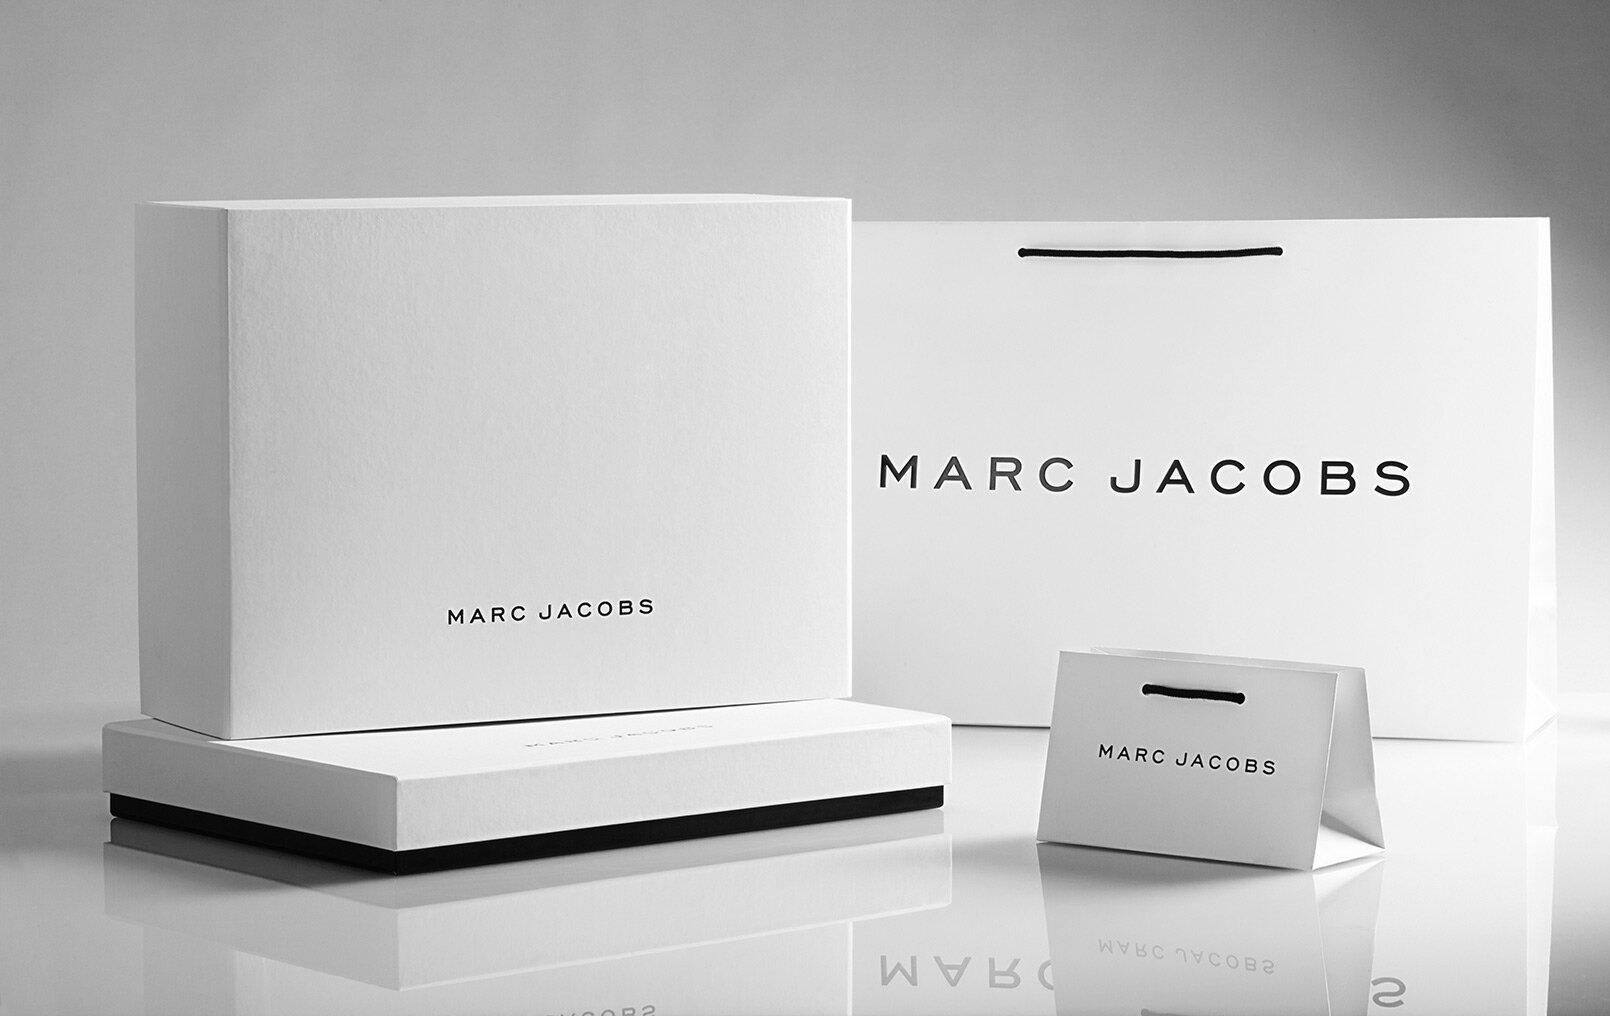 Marc-Jacobs-rigid-Box-Design-Packaging-Company-3.JPG